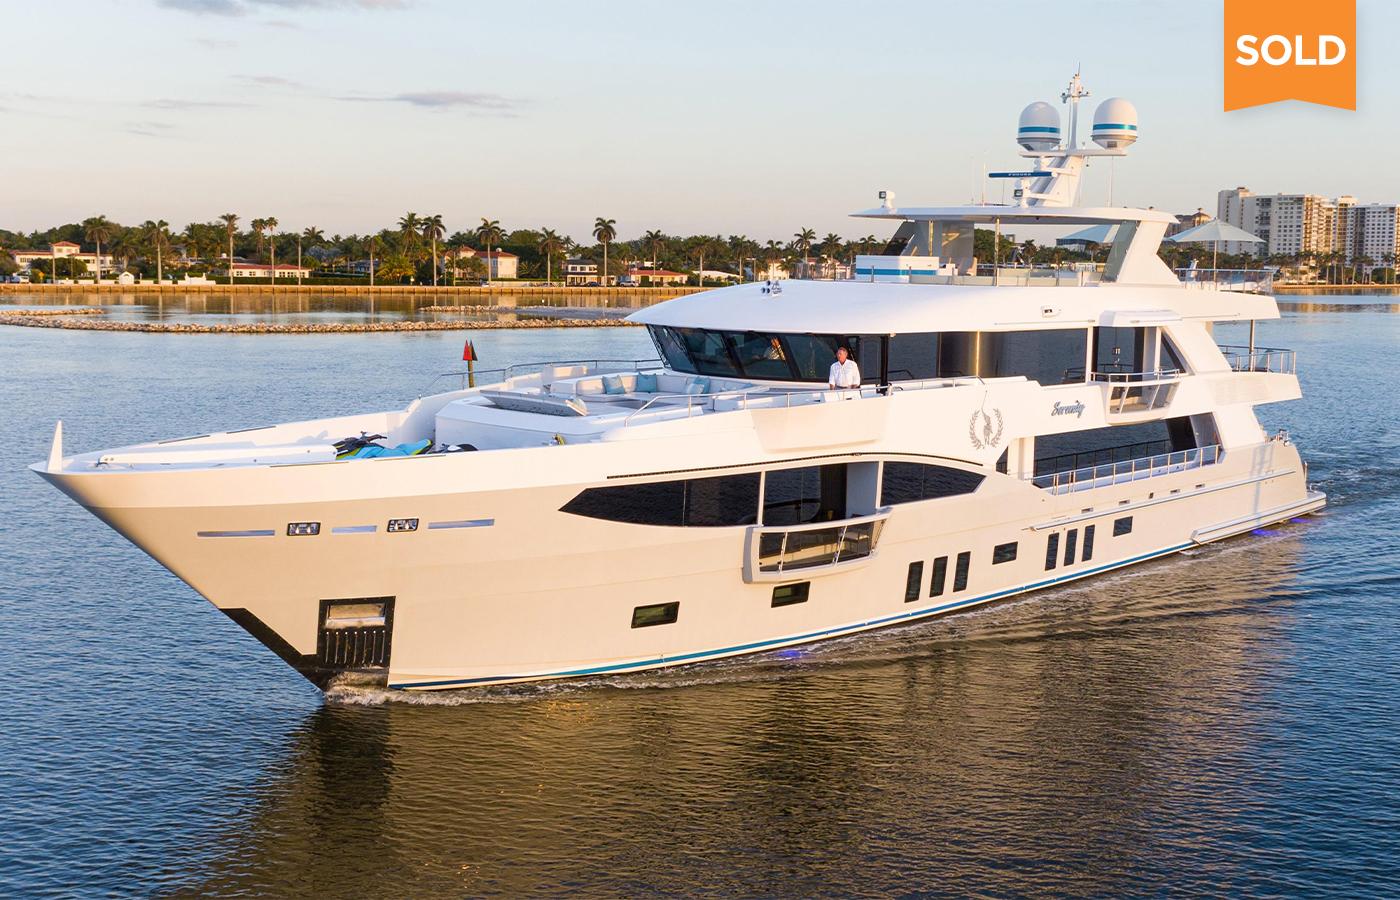 133' IAG Superyacht Sold By Kurt Bosshardt + Aleks Taldykin